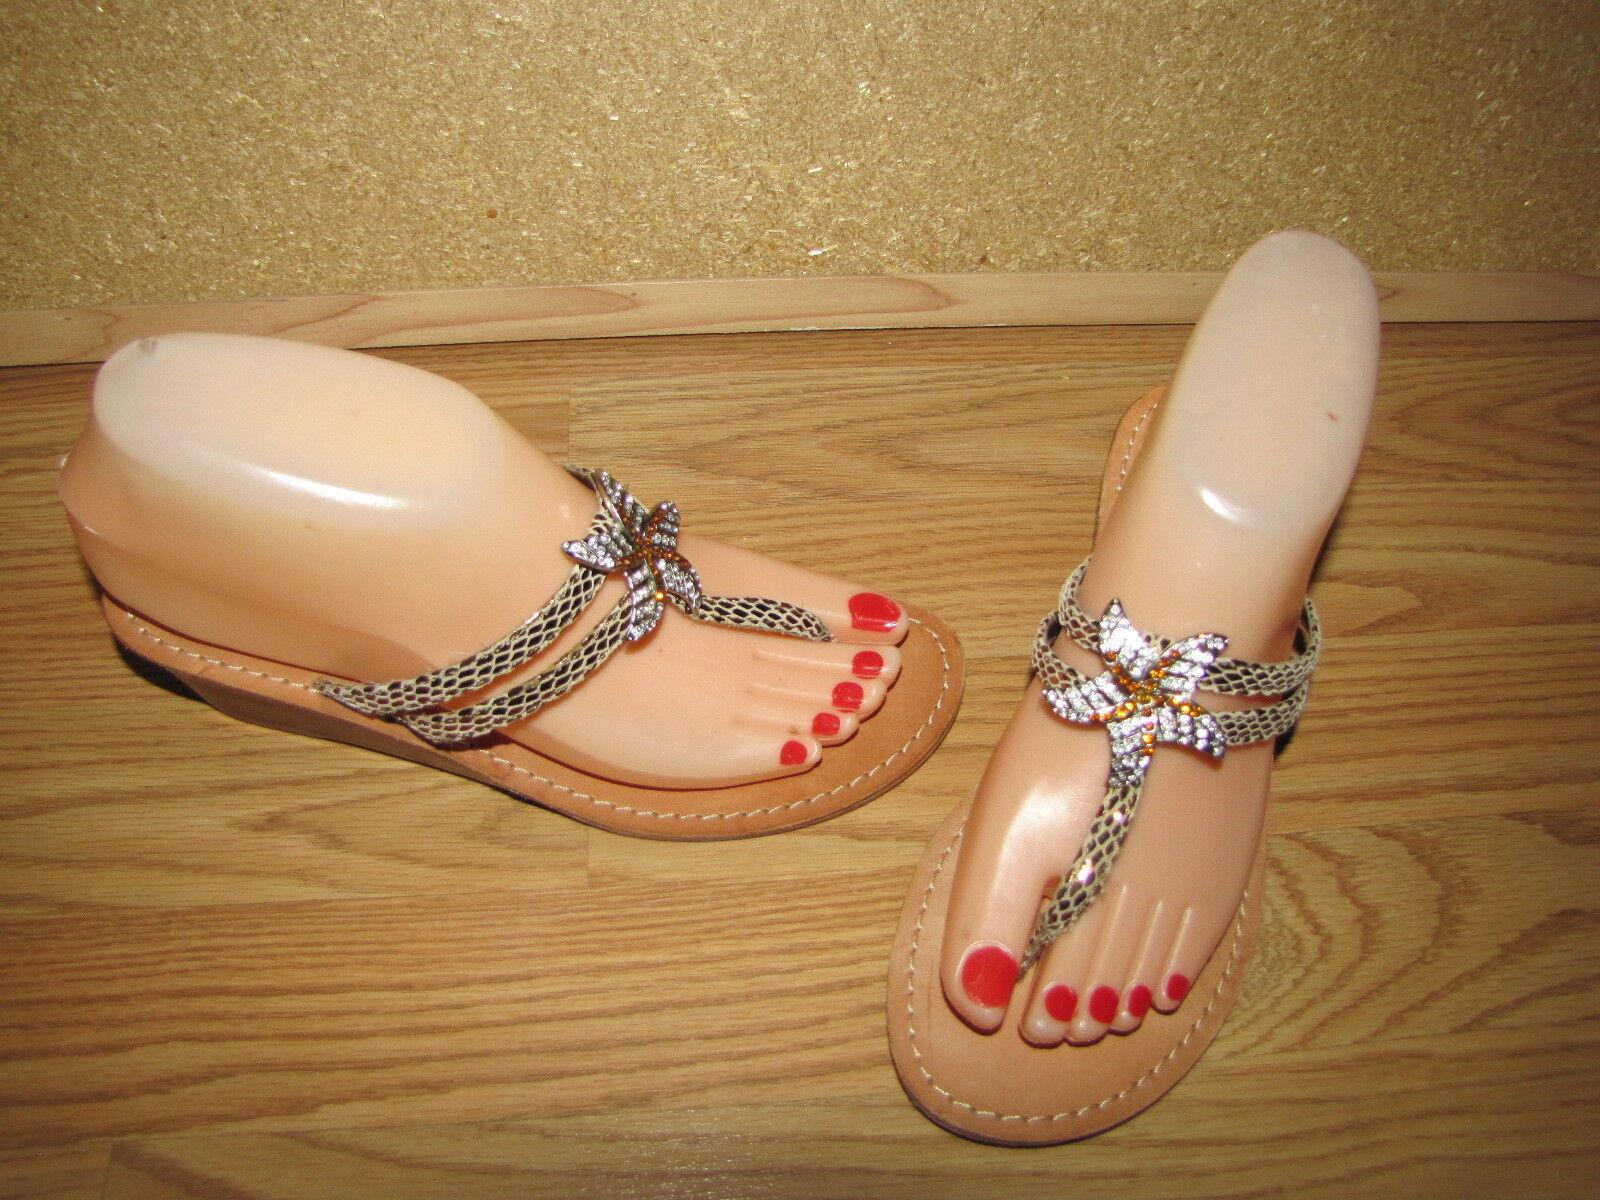 Yellow Sandals Box Starfish Rhinestone Thong Sandals Yellow - 6 European 36.5 EUC a3fbf2